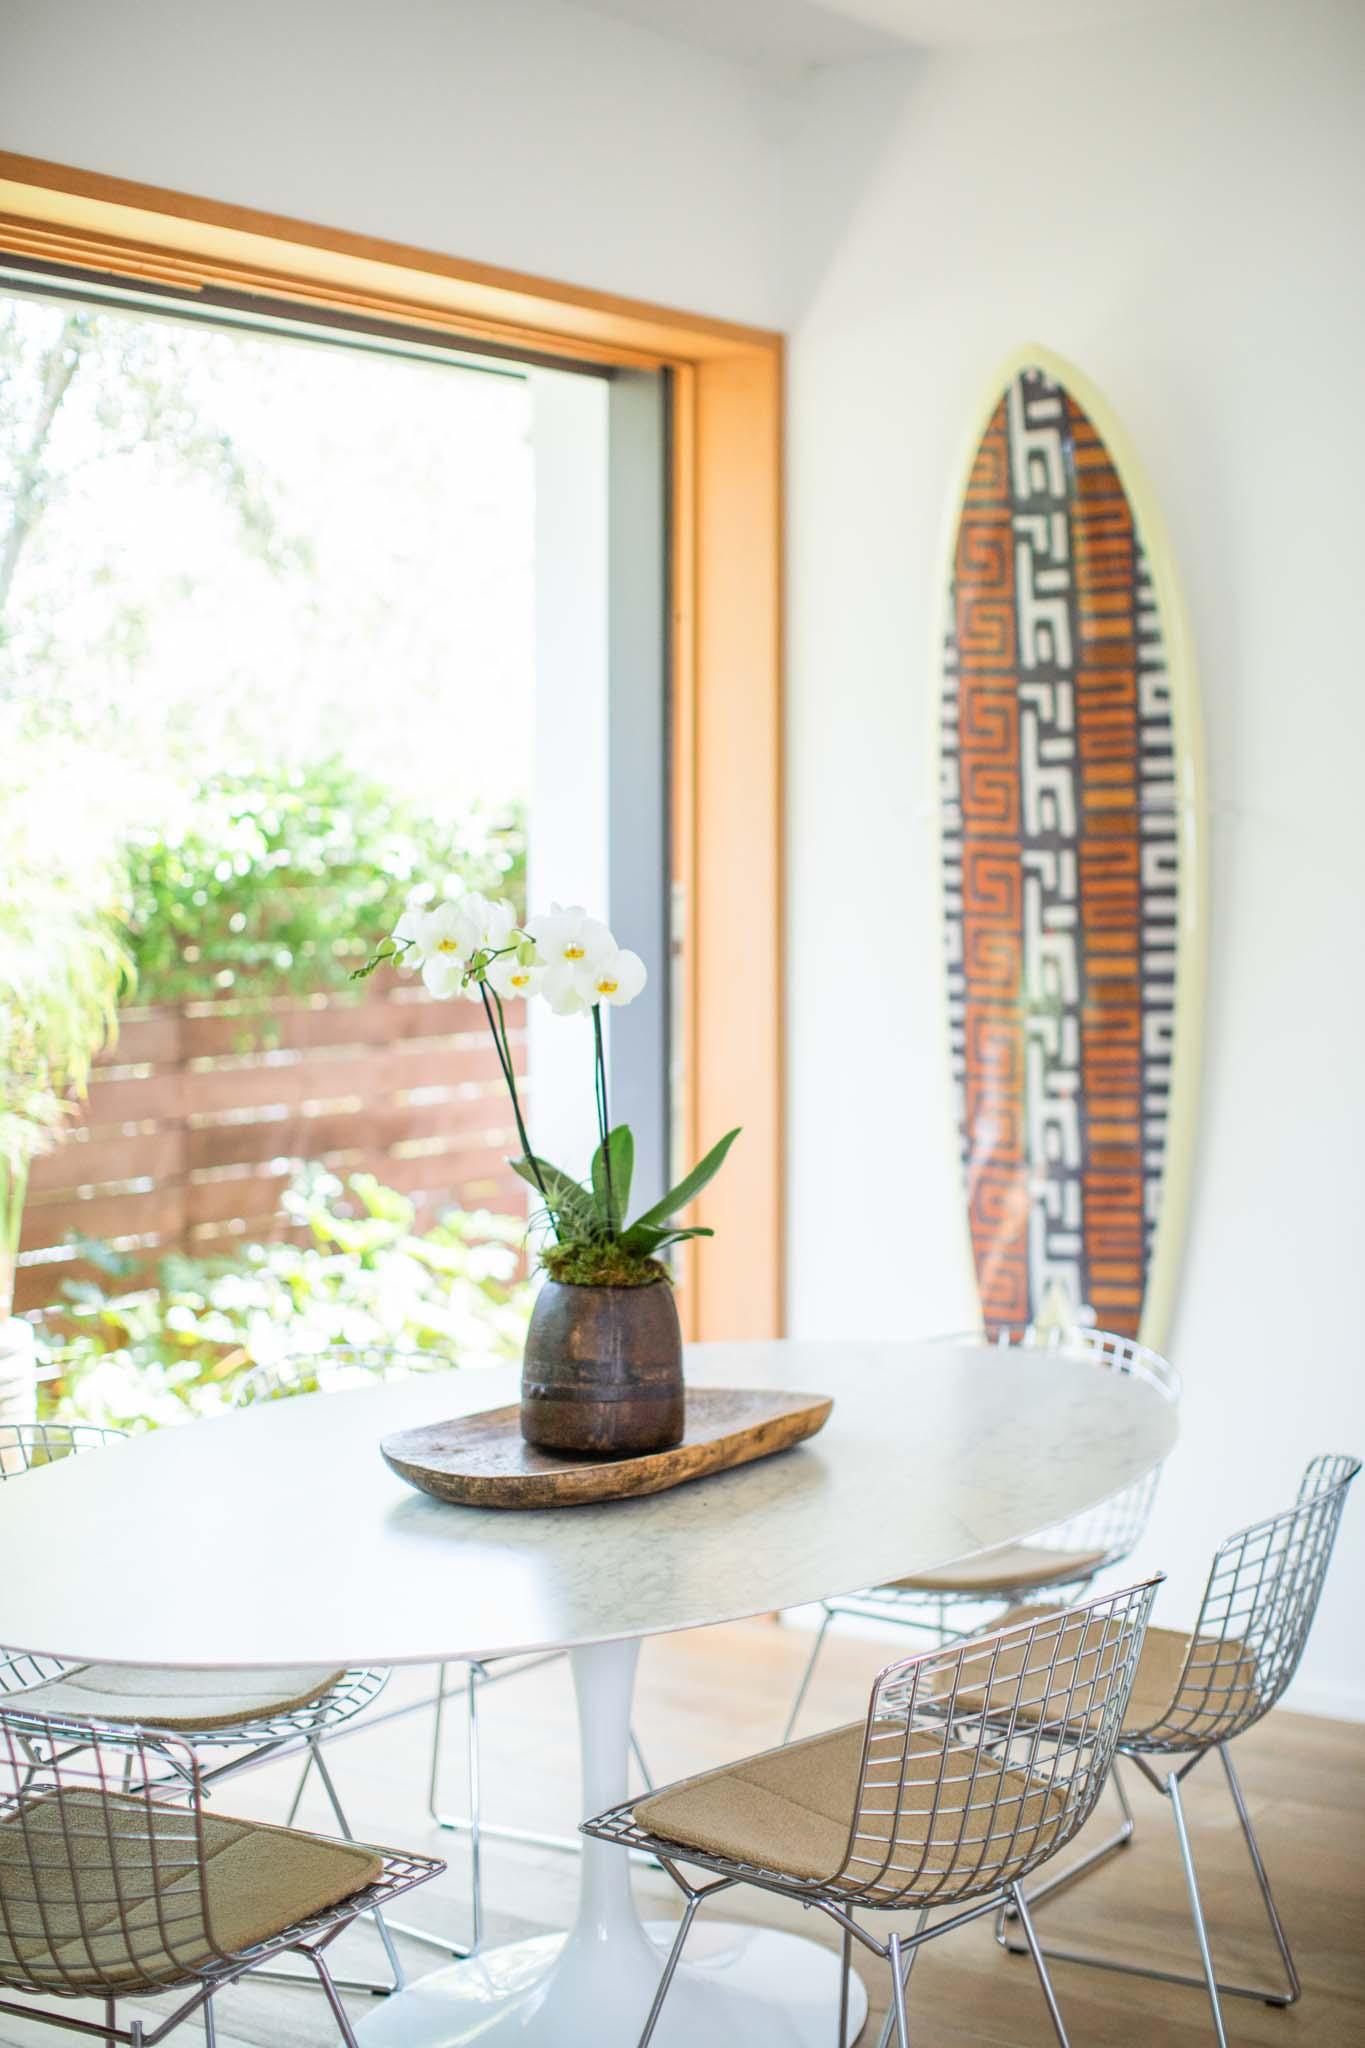 Jodi G Designs | Santa Barbara Interior Design Lanscape -5.jpg